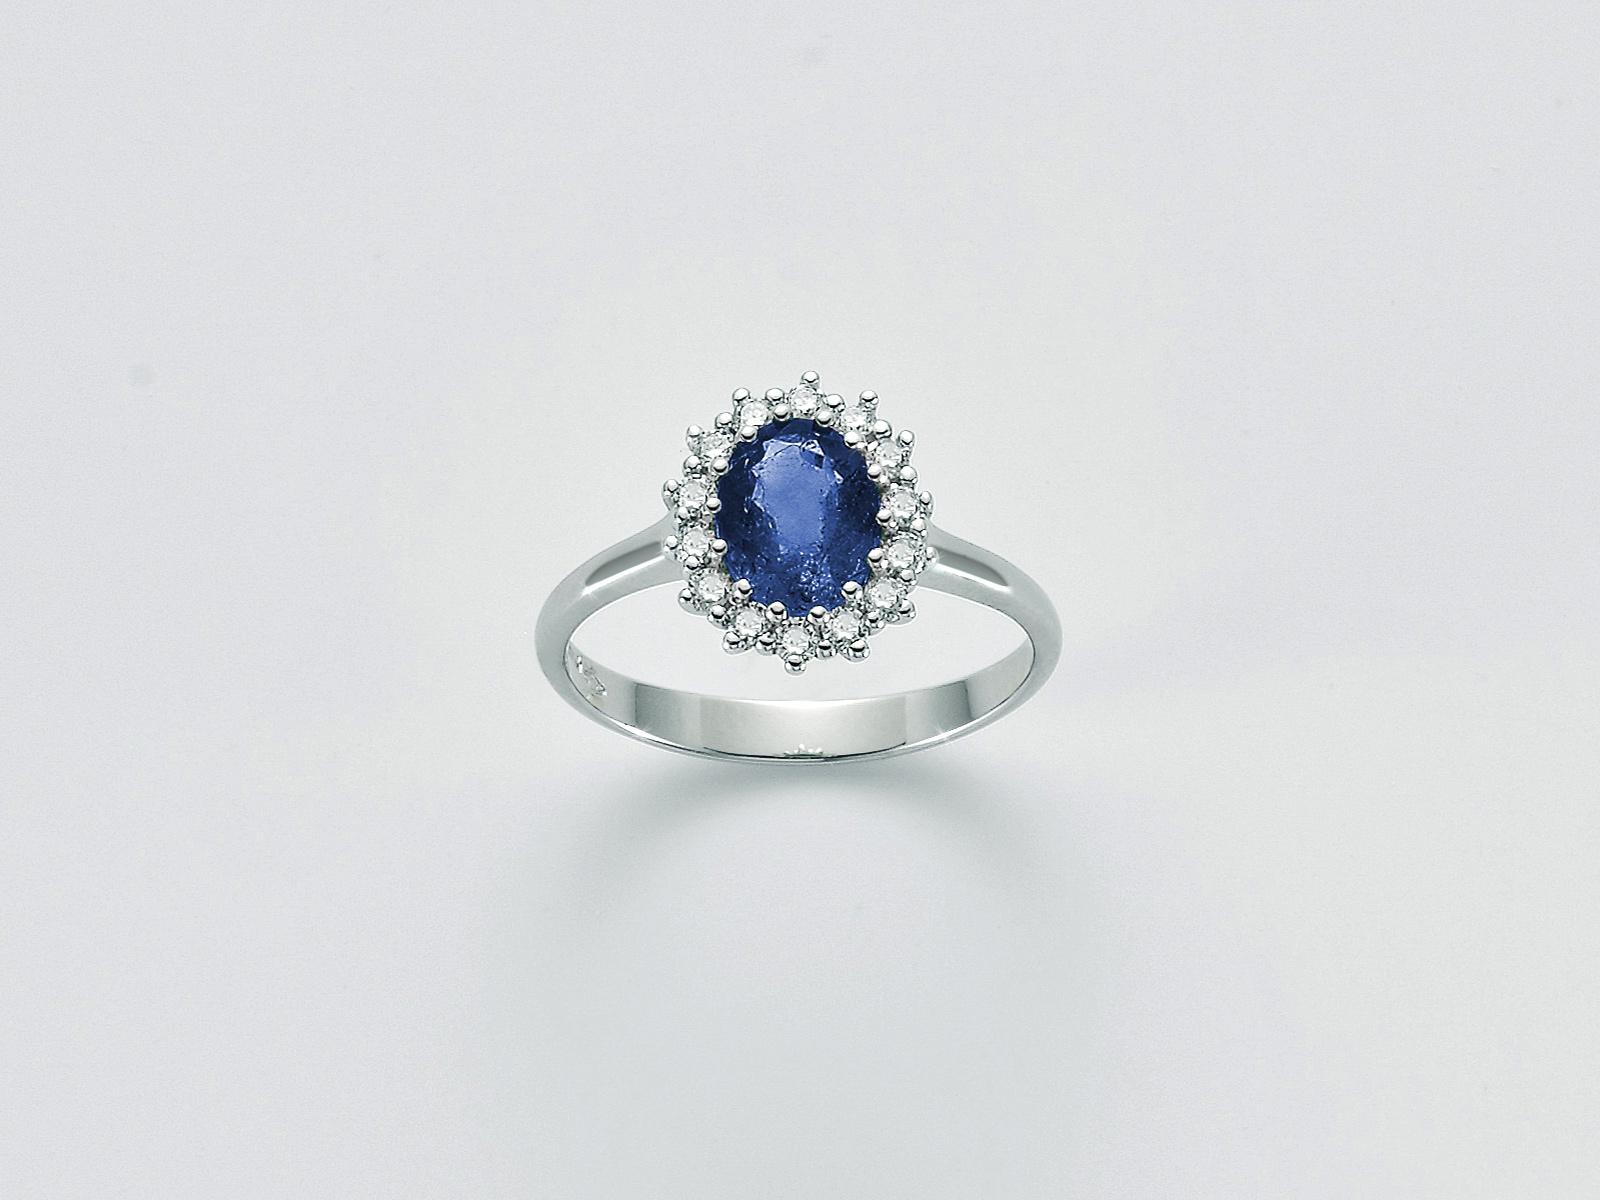 Anello donna Miluna LID3284 zaffiro blu